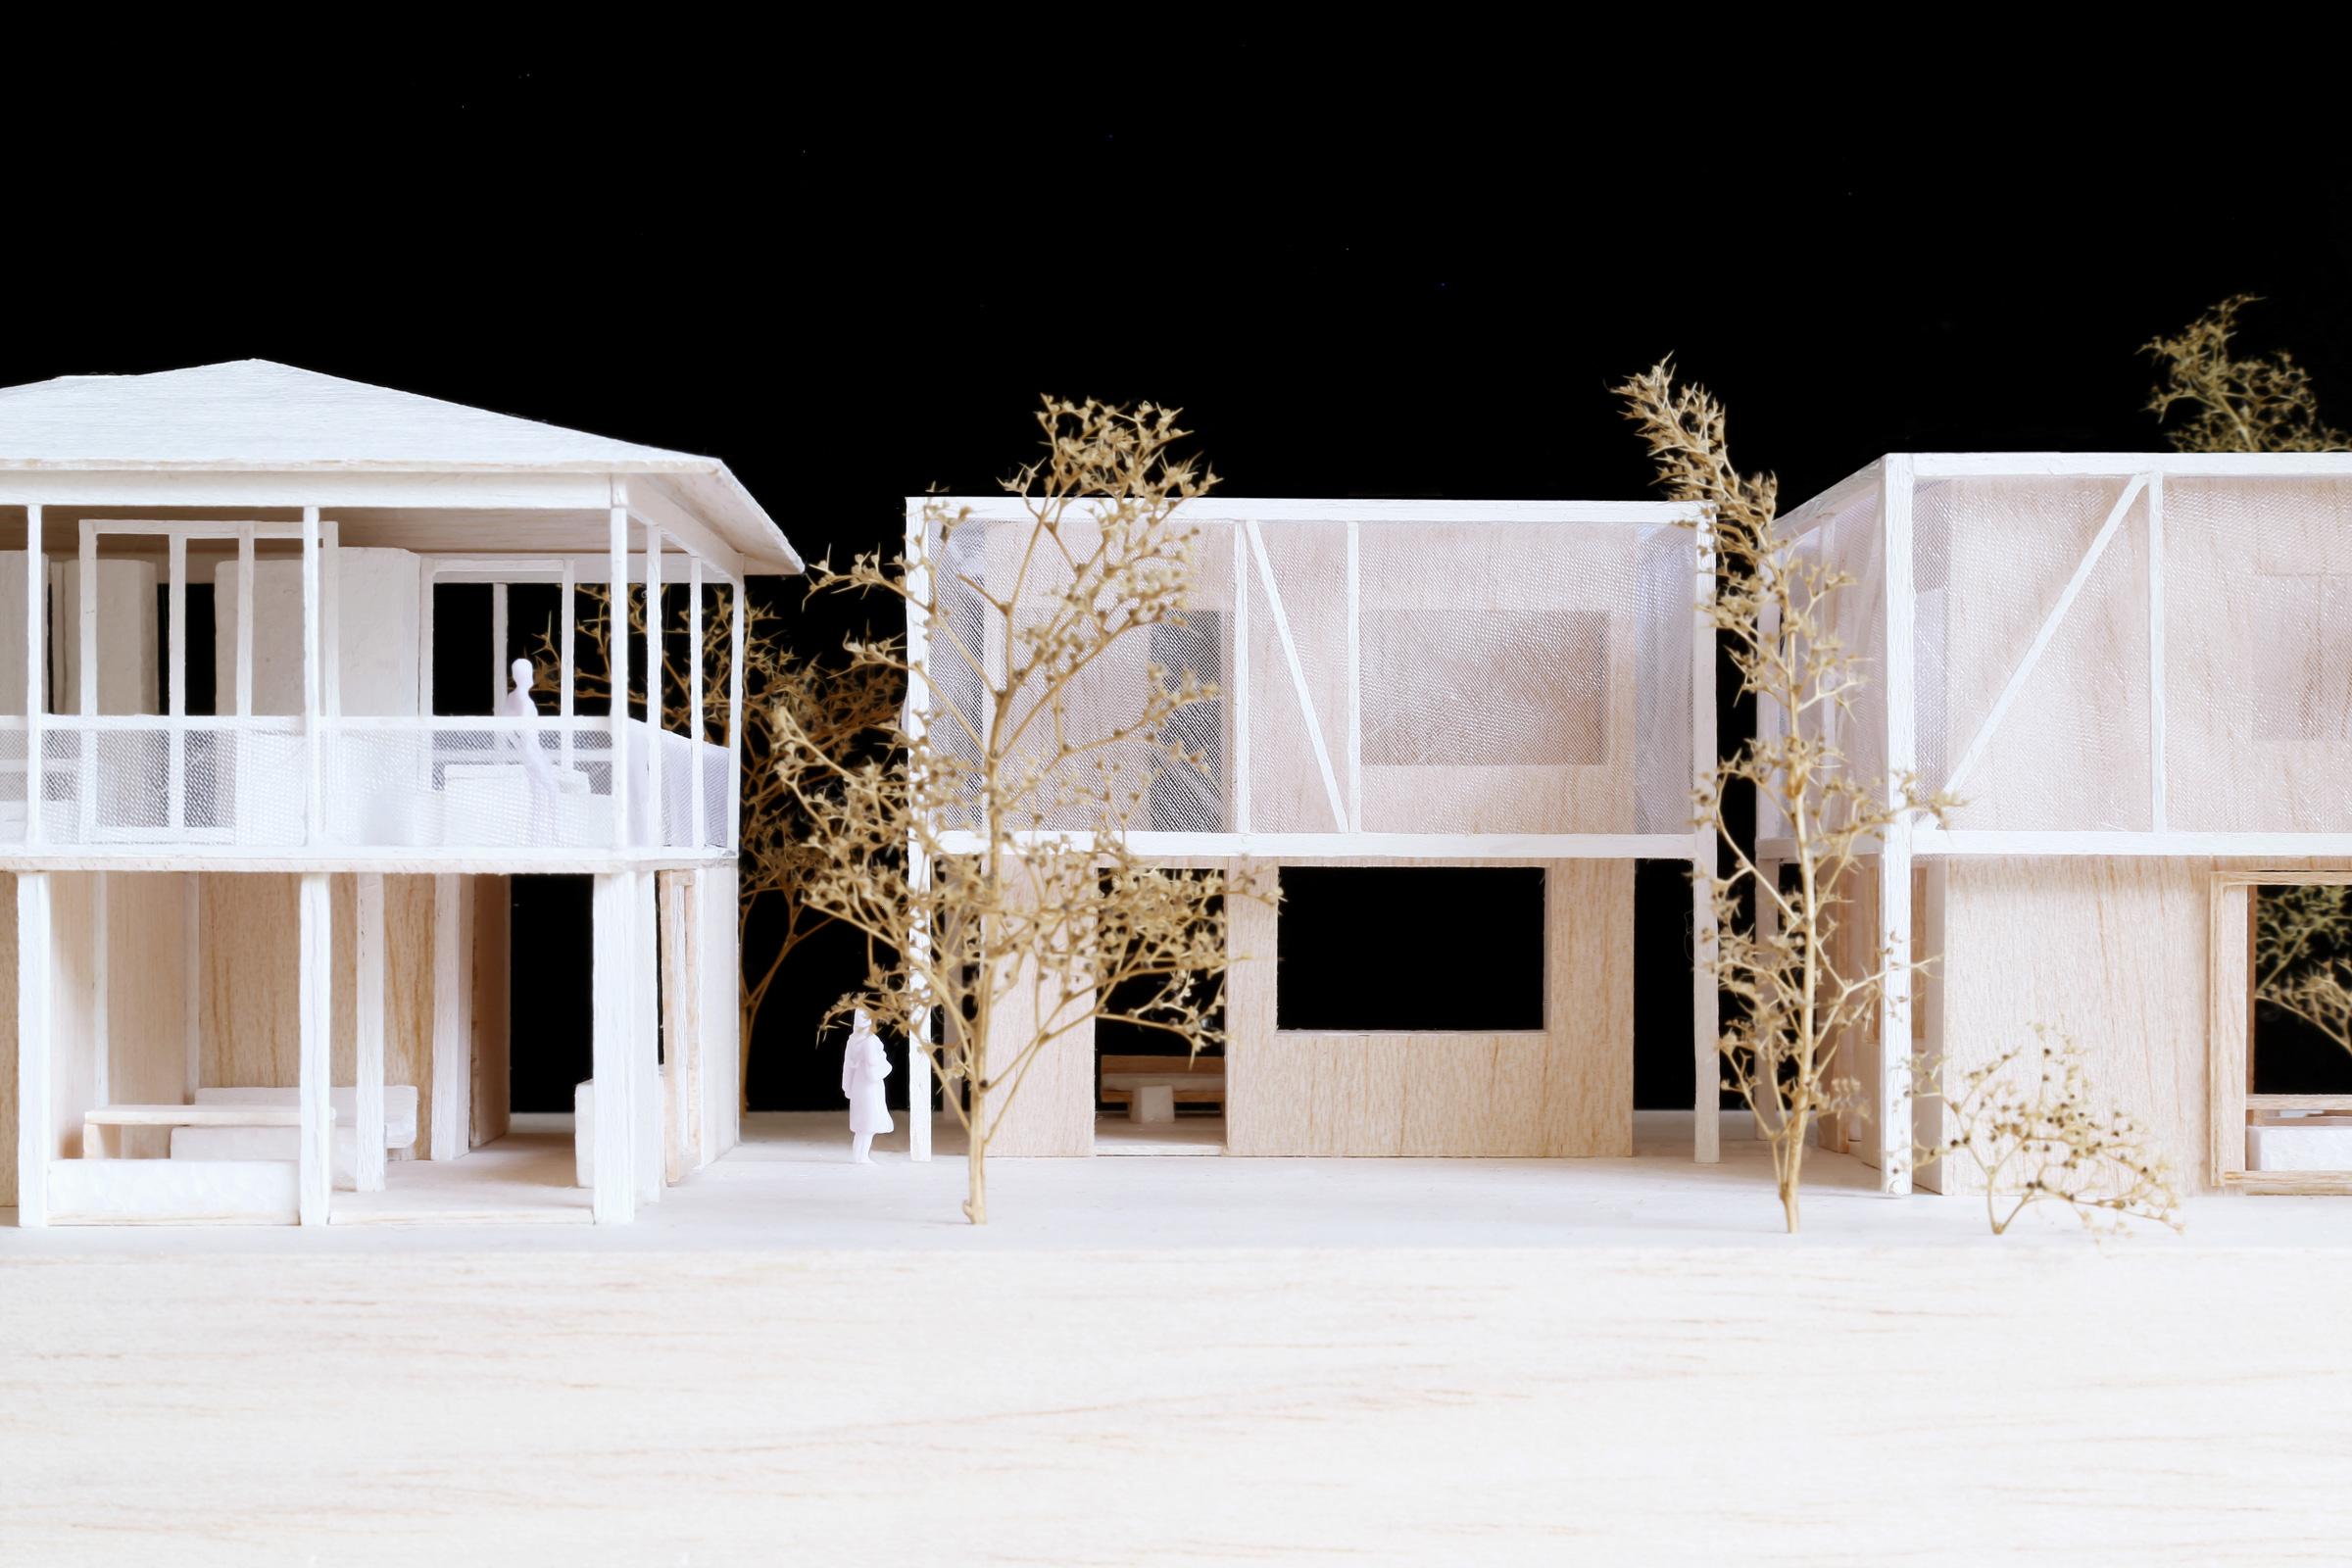 QUEENSLAND-RESIDENTIAL-ARCHITECT-TRIAS-STUDIO-QUEENSLAND-HOUSE-M04